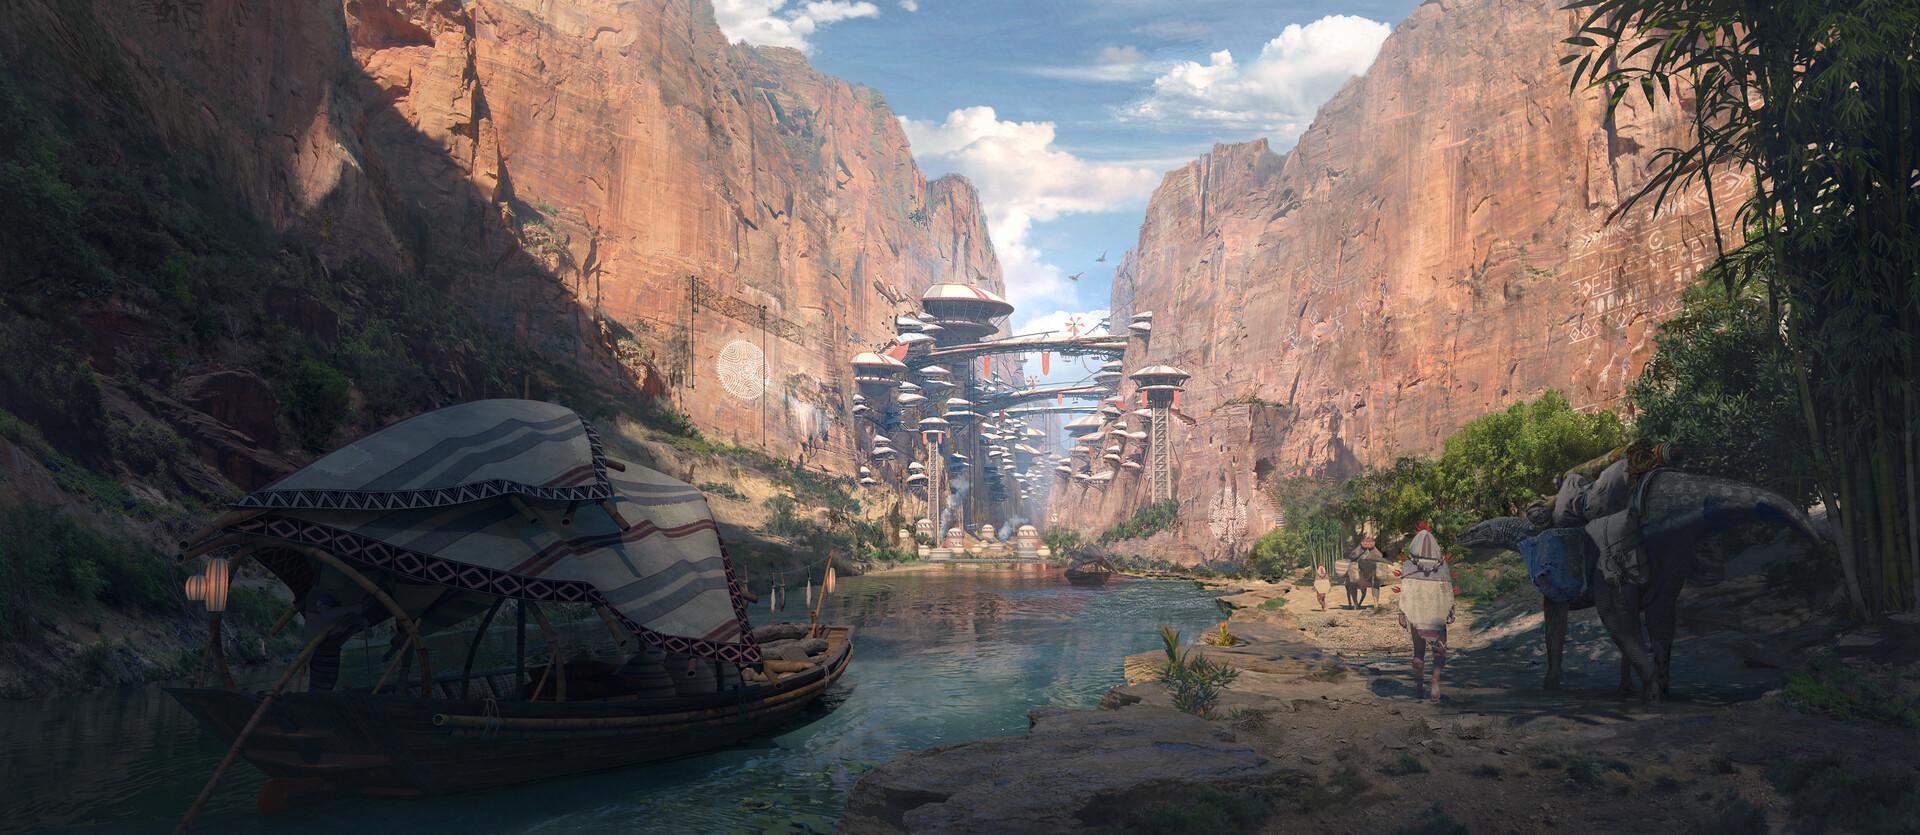 Jordi van hees canyon city rendering 007 small